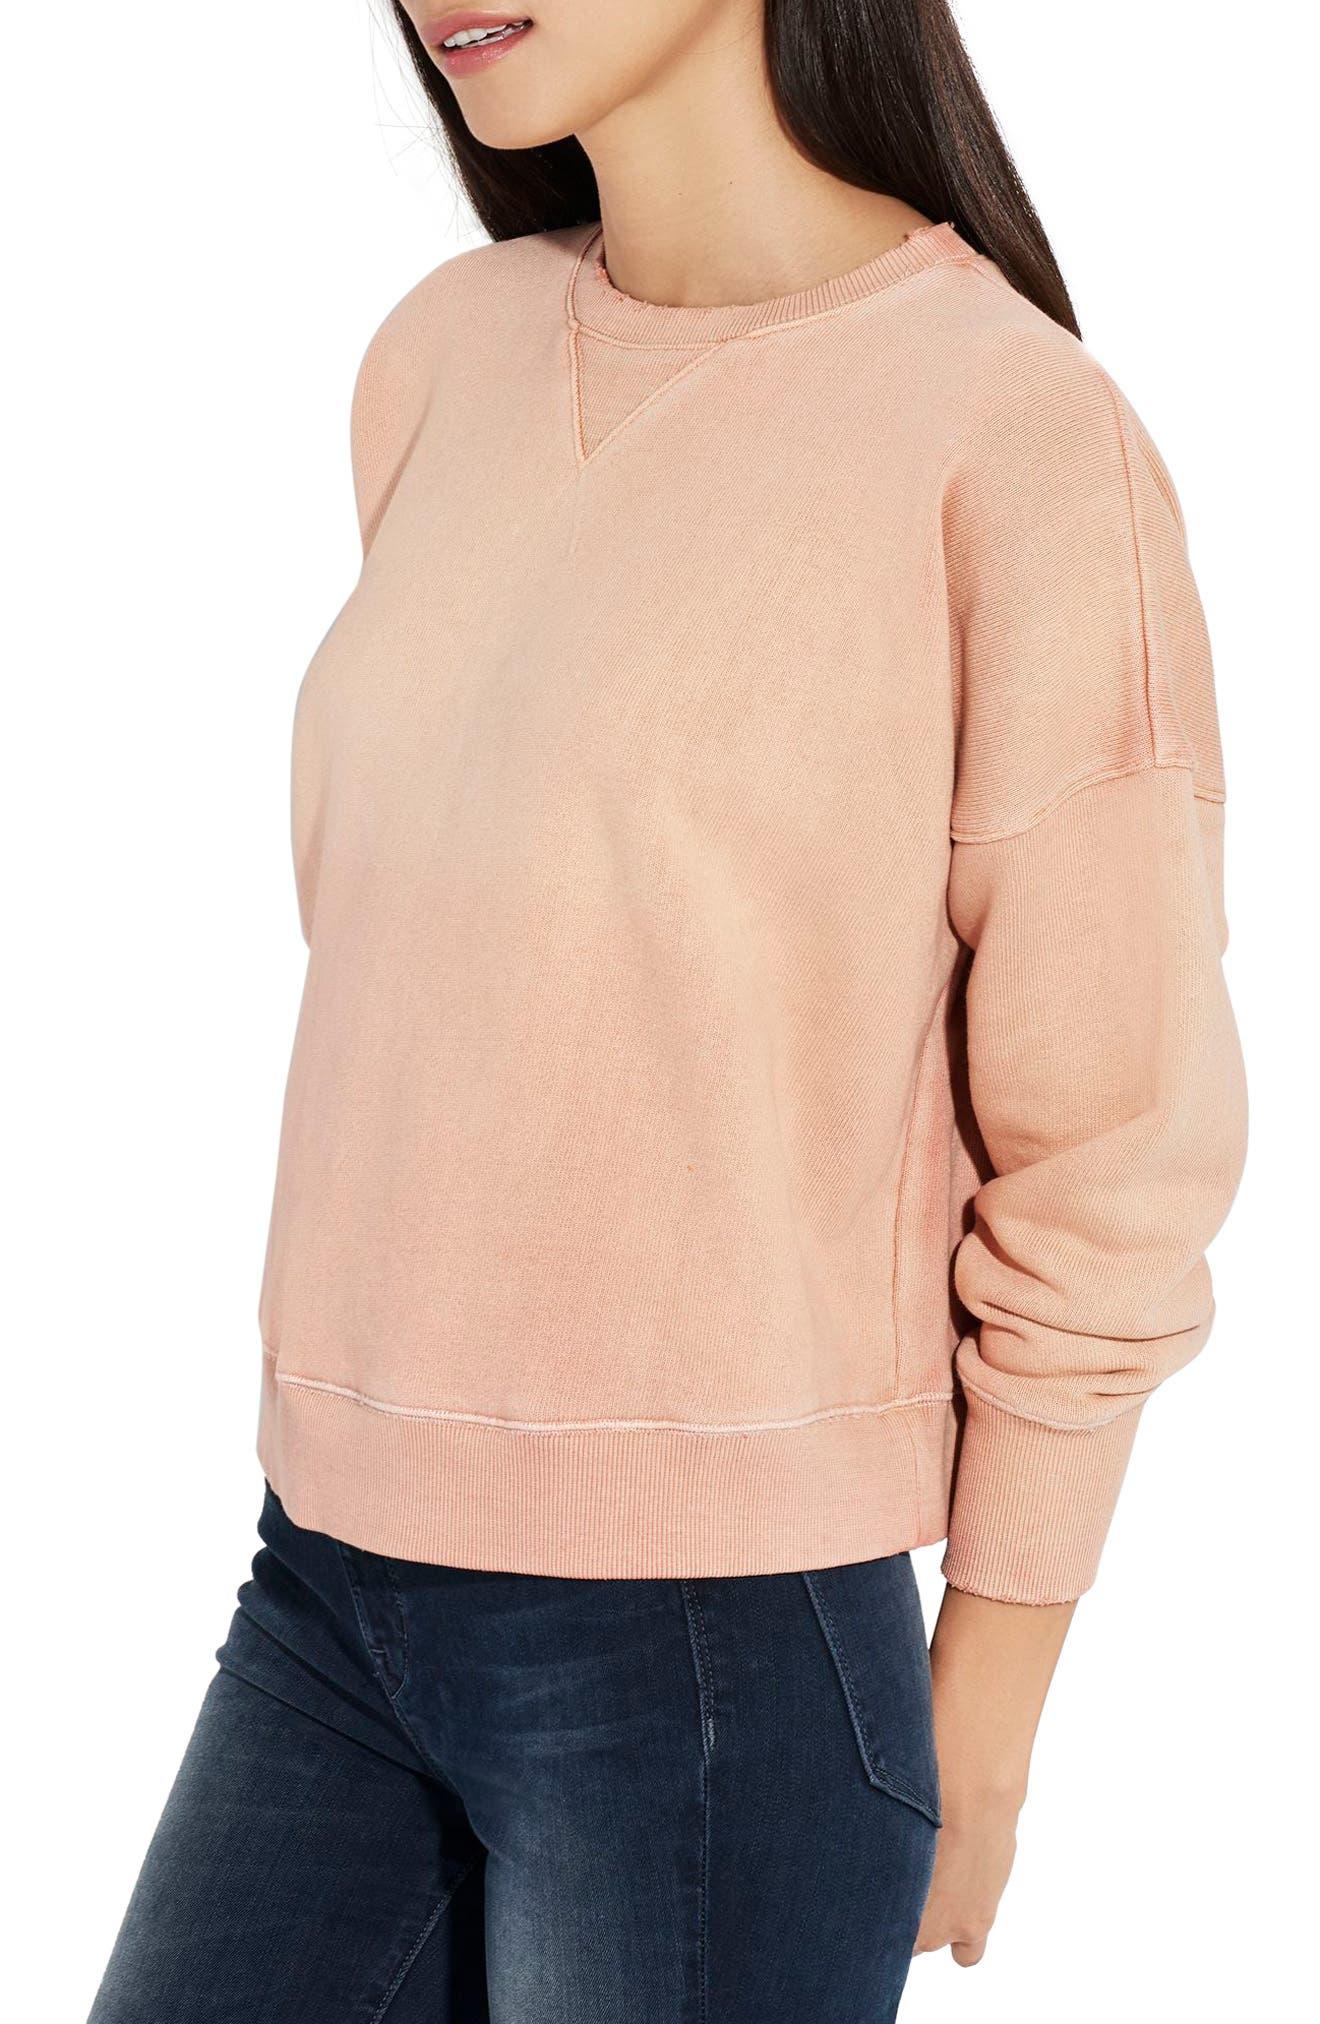 The Big Guy Sweatshirt,                             Alternate thumbnail 3, color,                             Popsicle